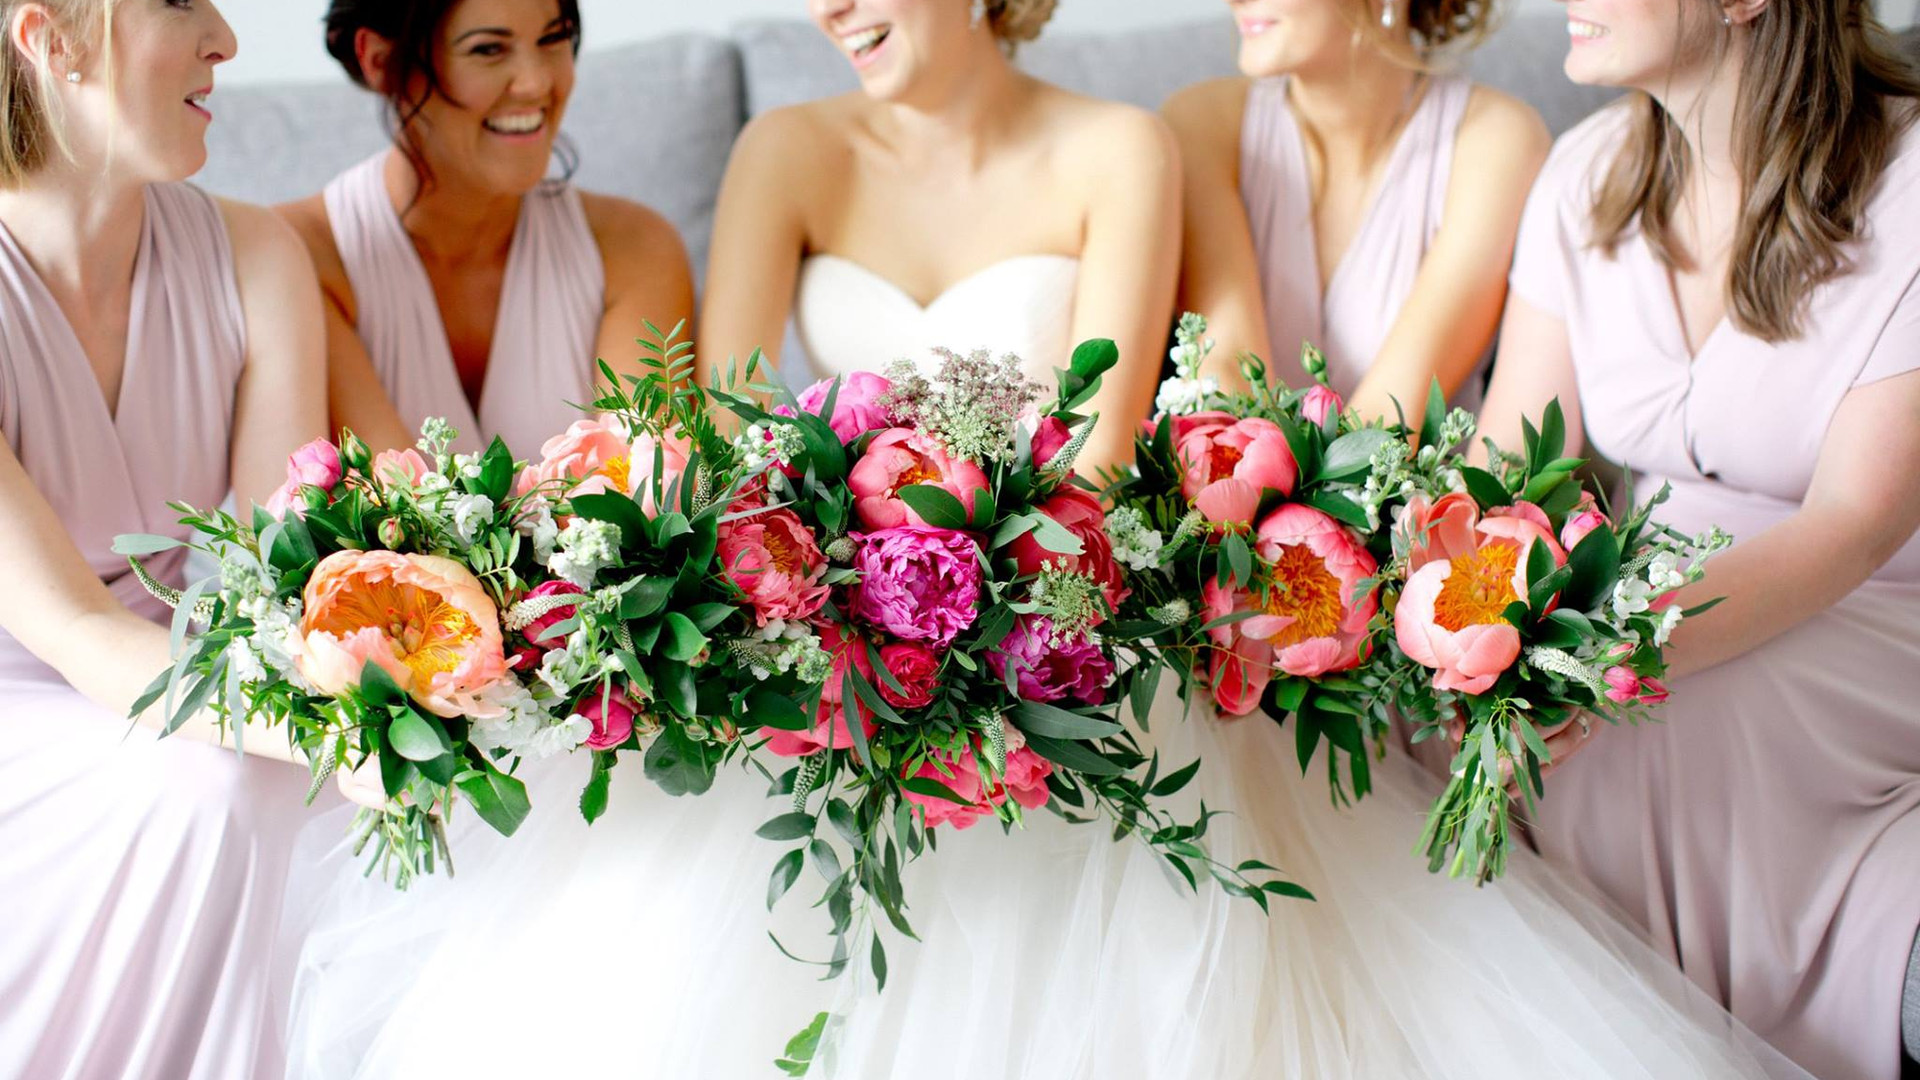 The Floral Artisan - Wedding Flowers